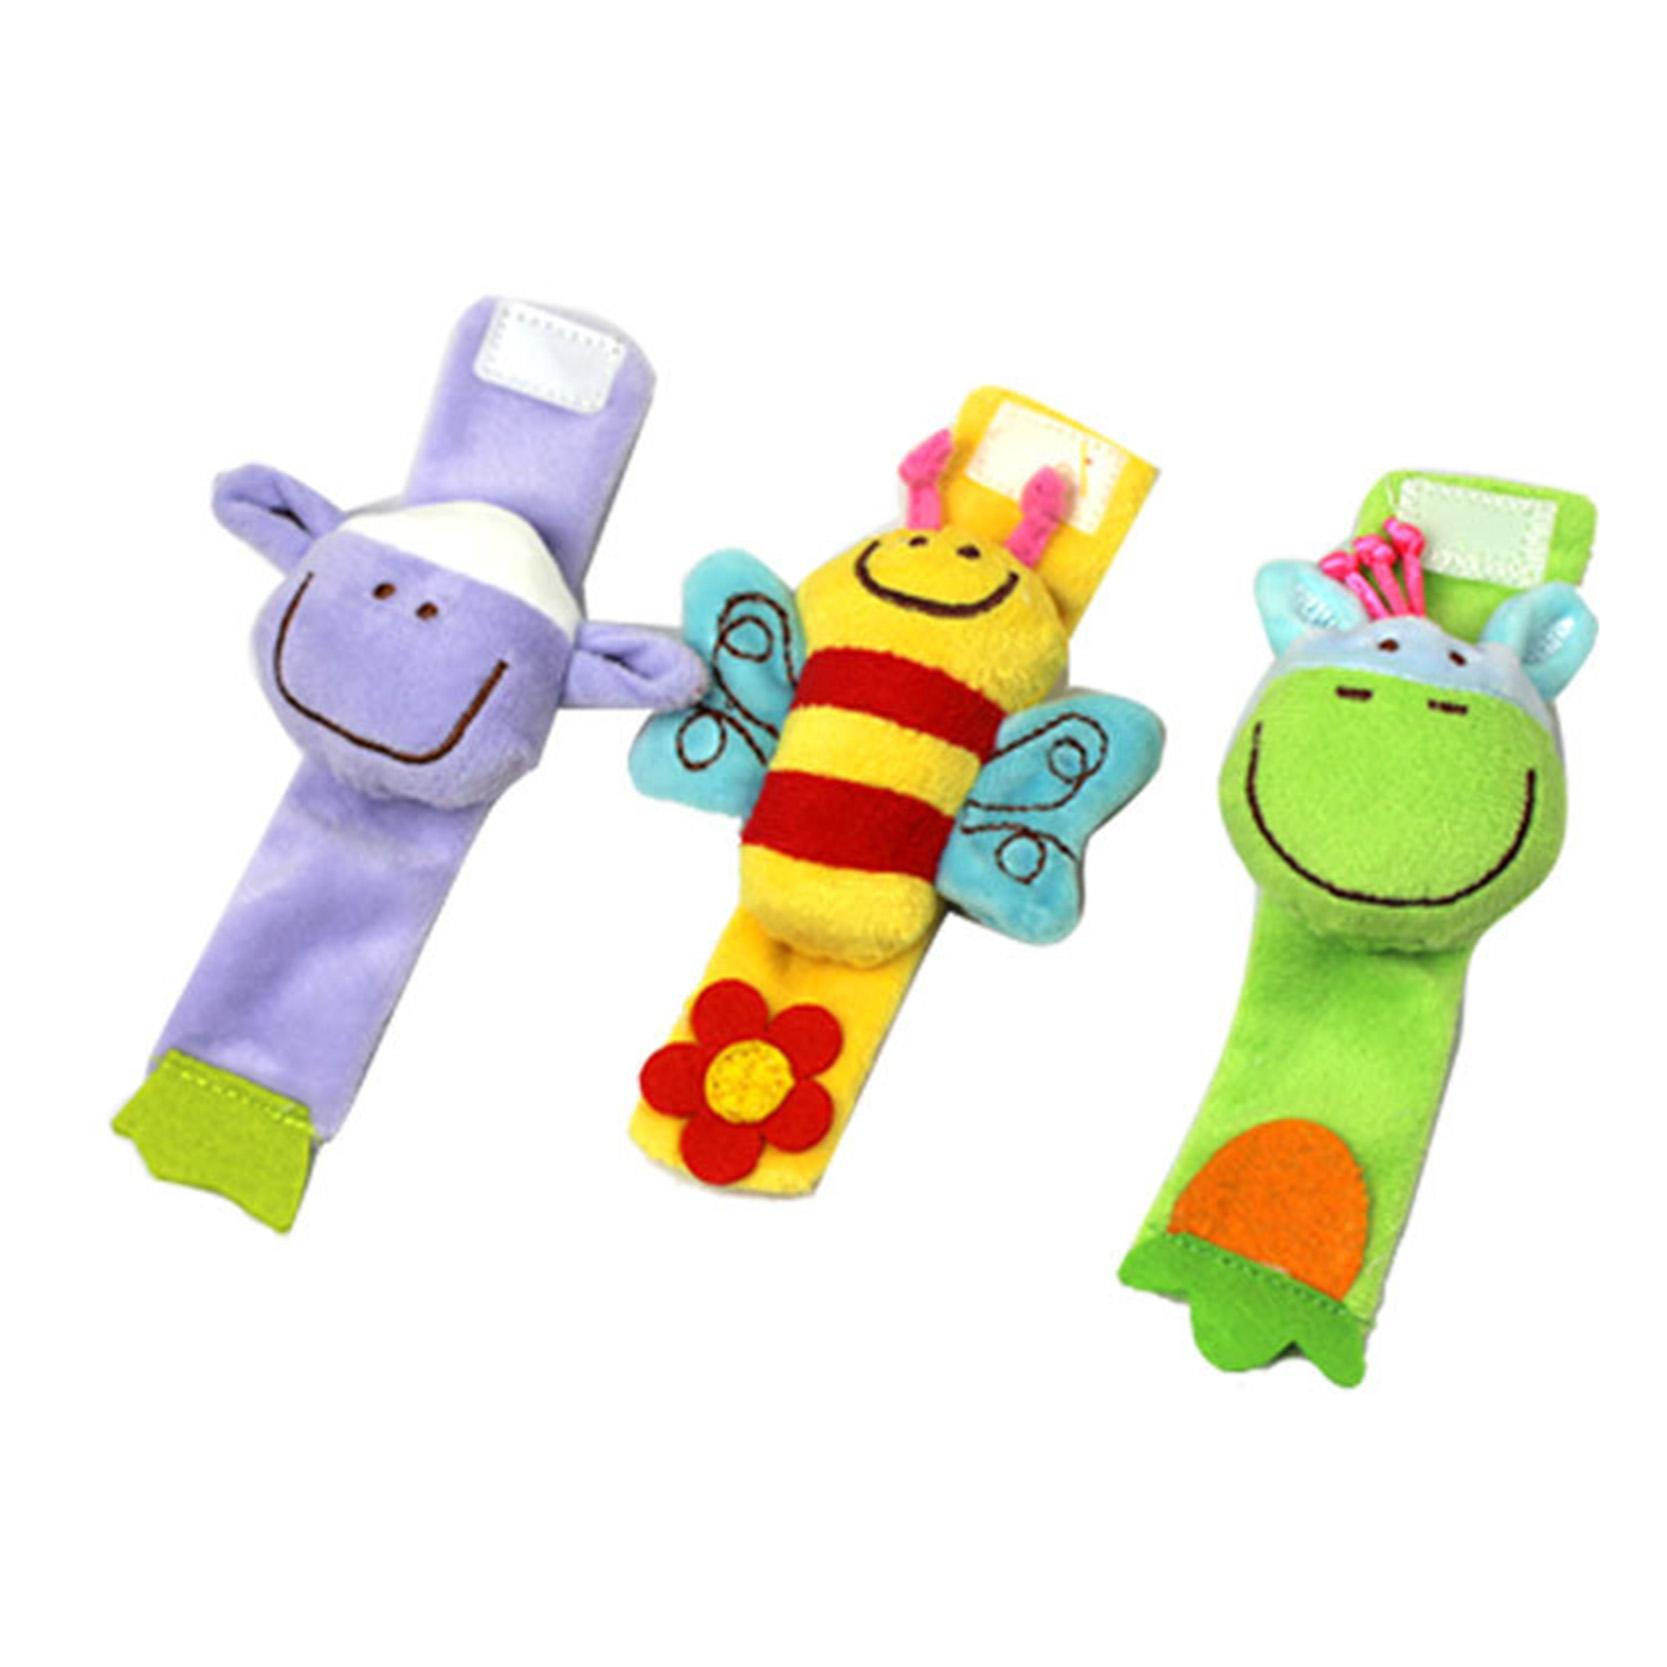 1 Piece Baby Infant Toy Baby Wrist Strap Soft Toy Cute Cartoon Animal Plush Rattle Strap<br><br>Aliexpress